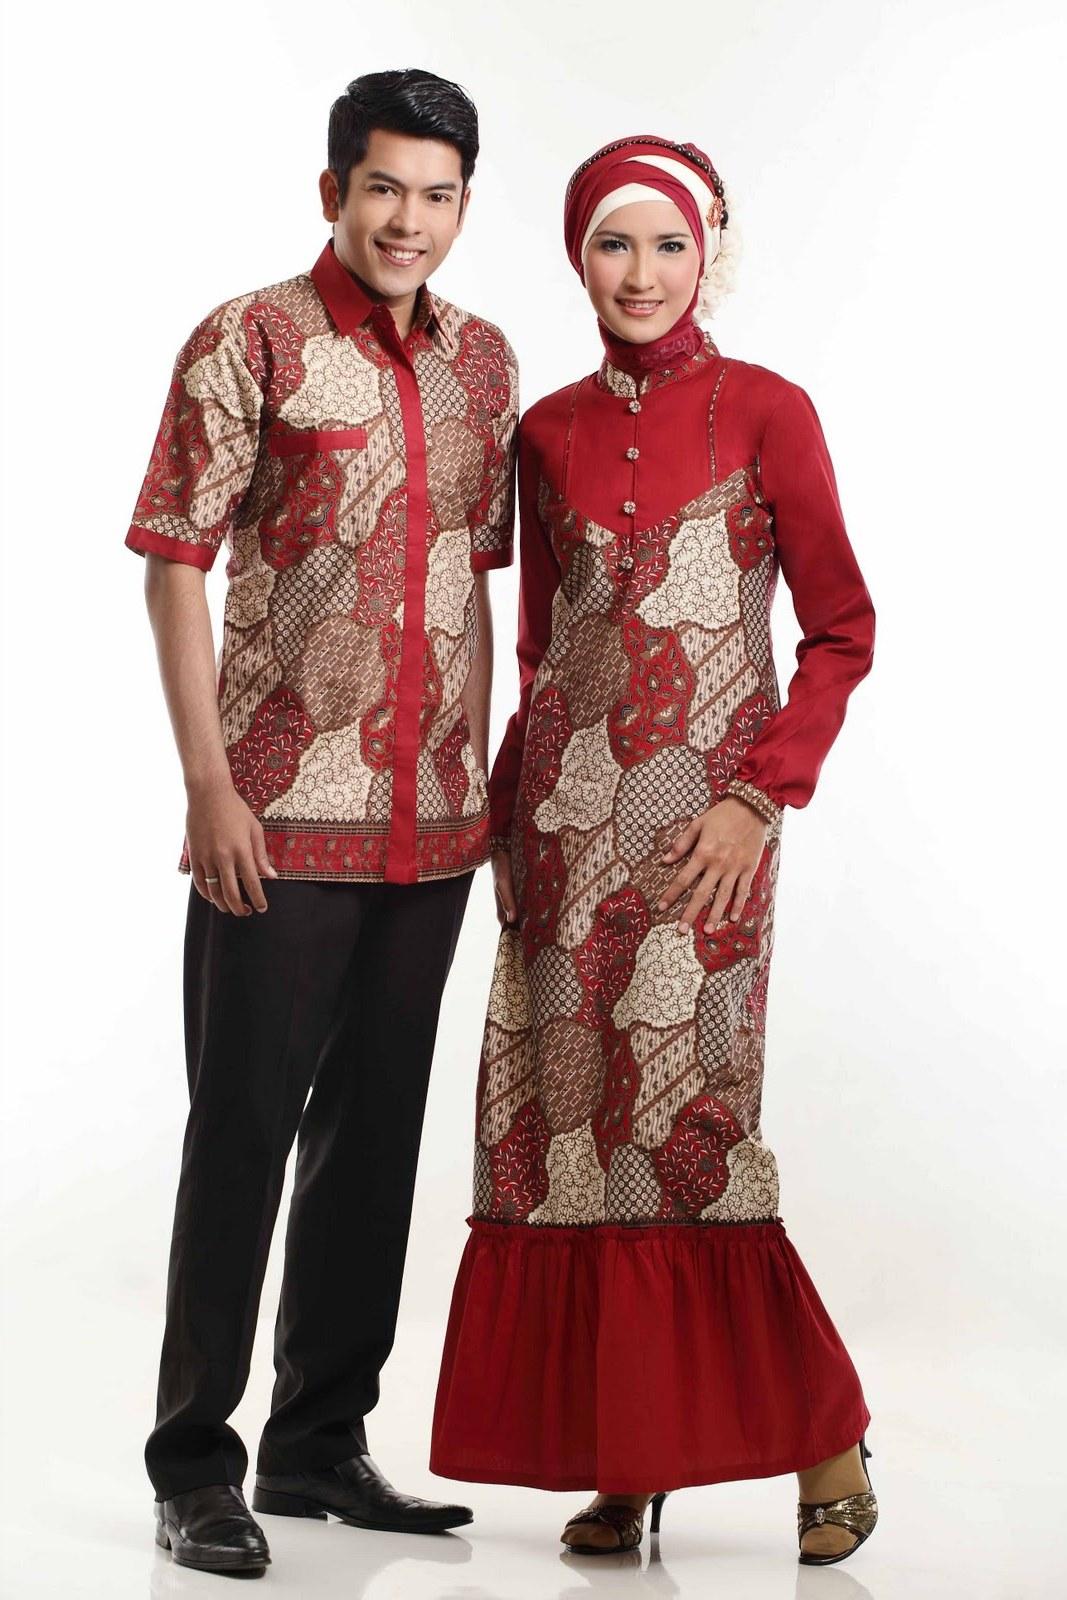 Inspirasi Gambar Baju Lebaran Anak Ftd8 Bintang anda Trend Model Baju Batik Lebaran Terbaru 2013